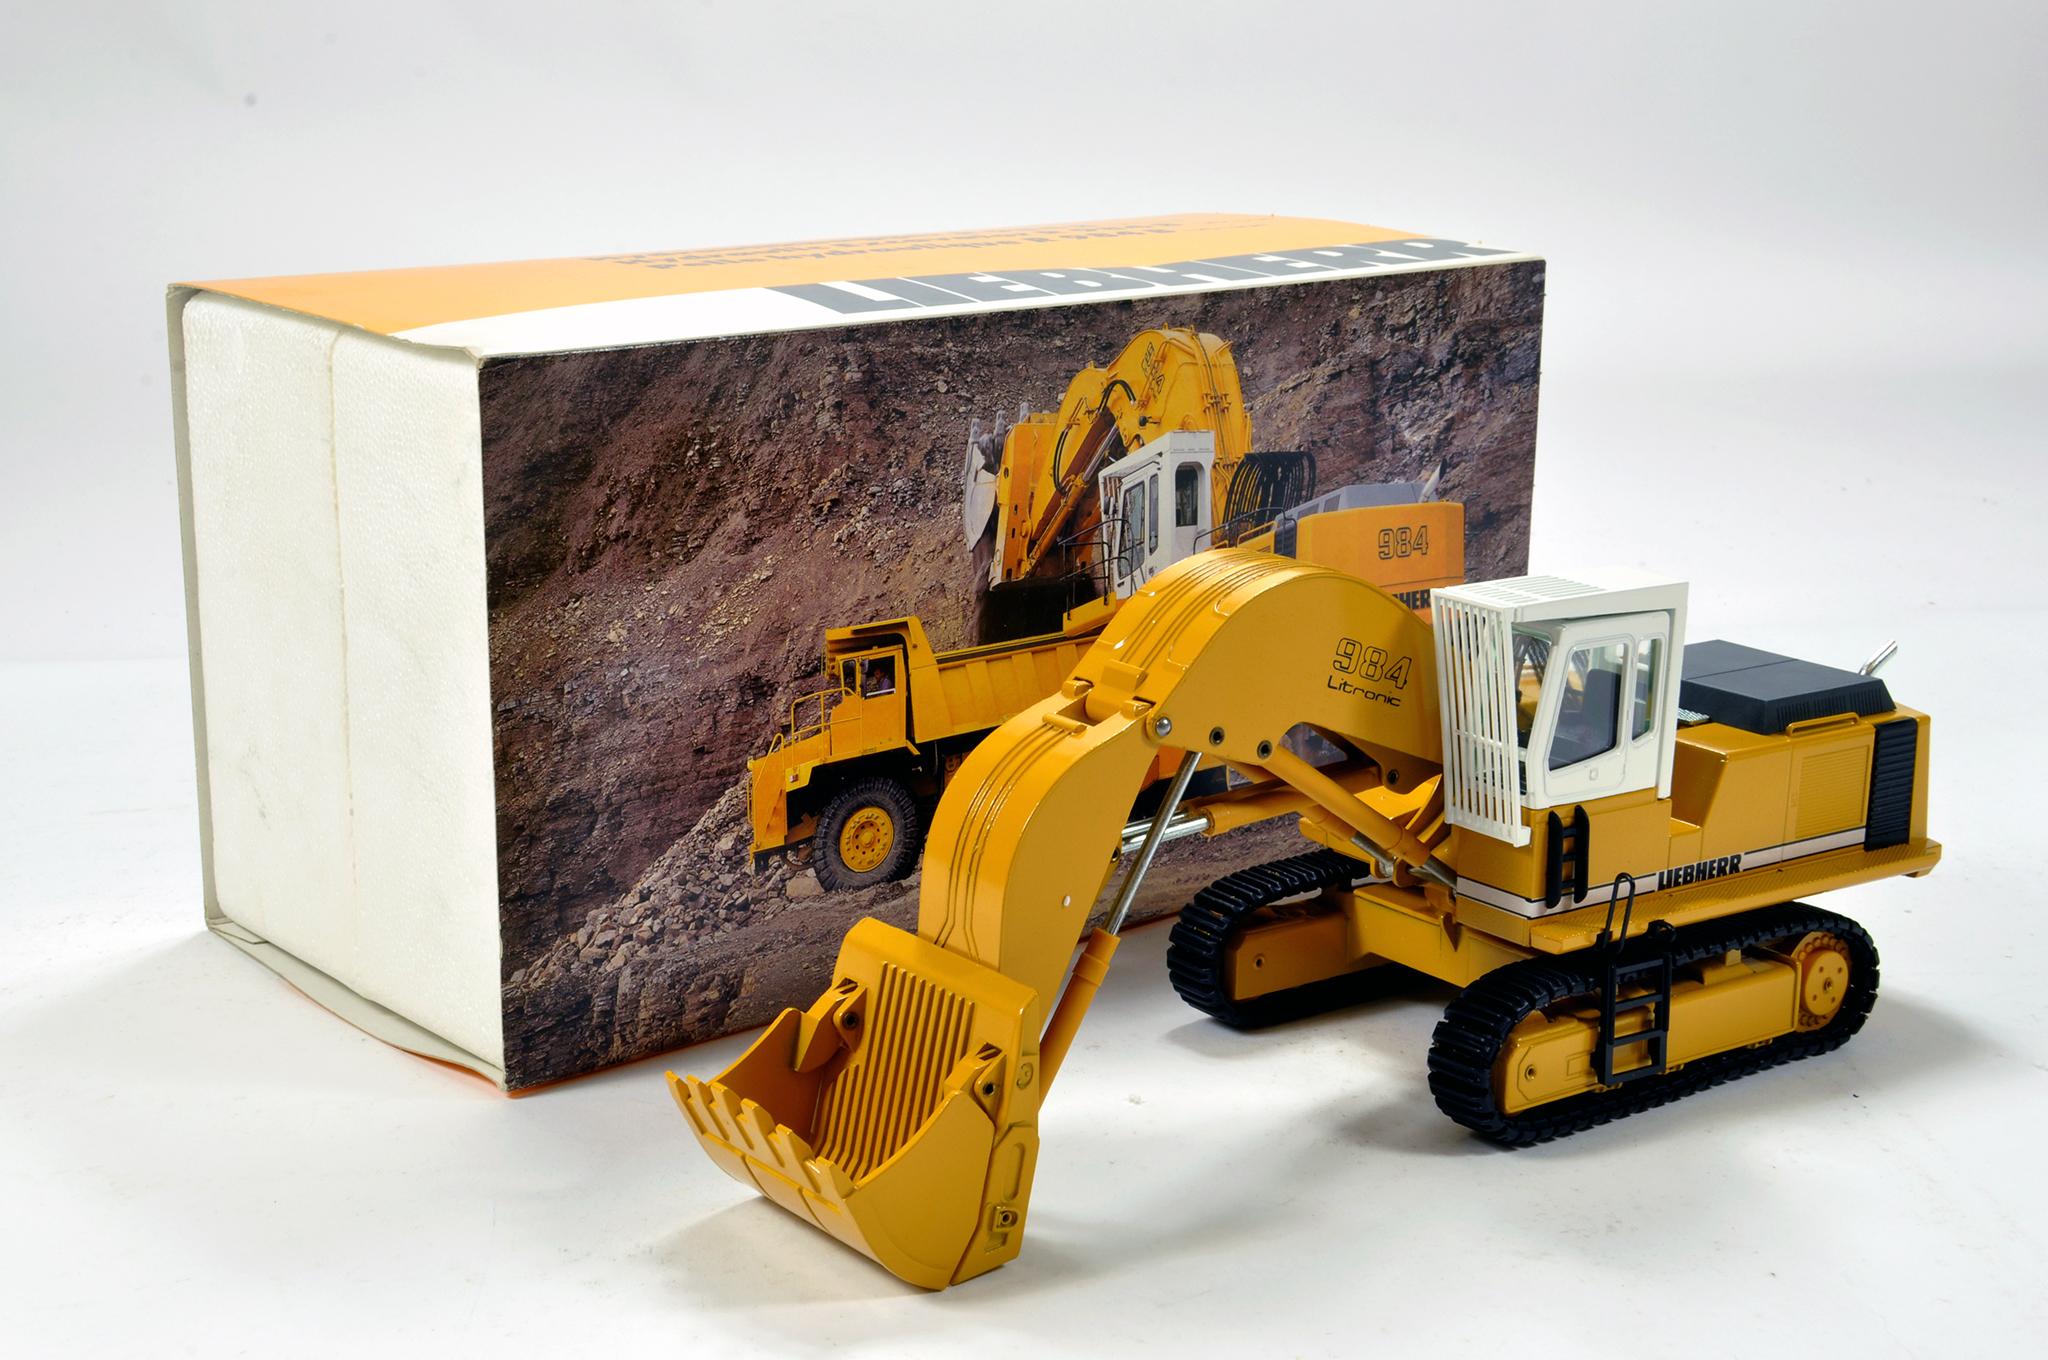 Lot 354 - Conrad 1/50 construction issue comprising Liebherr 984 Litronic Excavator. E to NM.